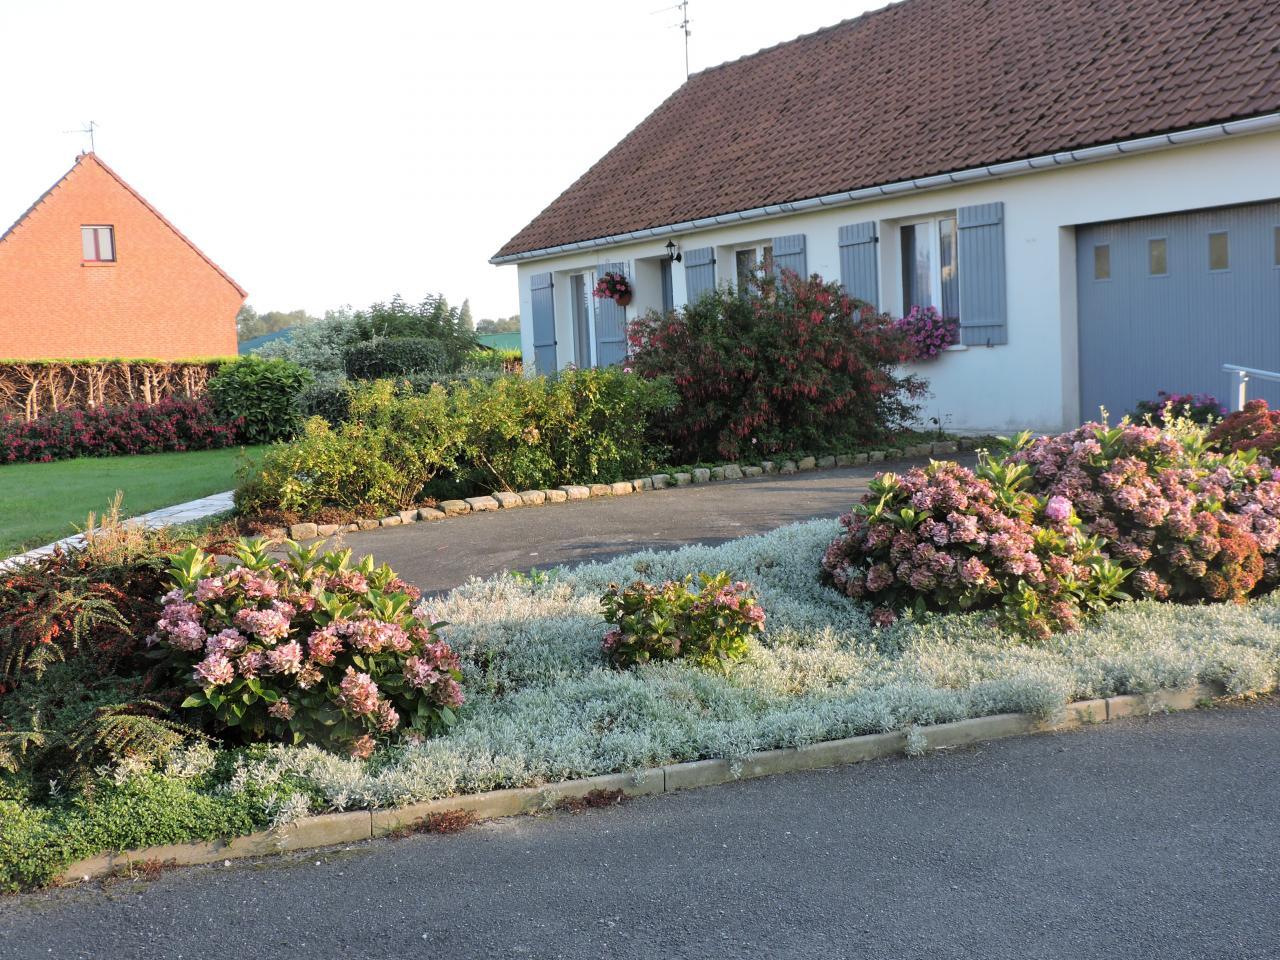 Maisons fleuries 2014 (29)